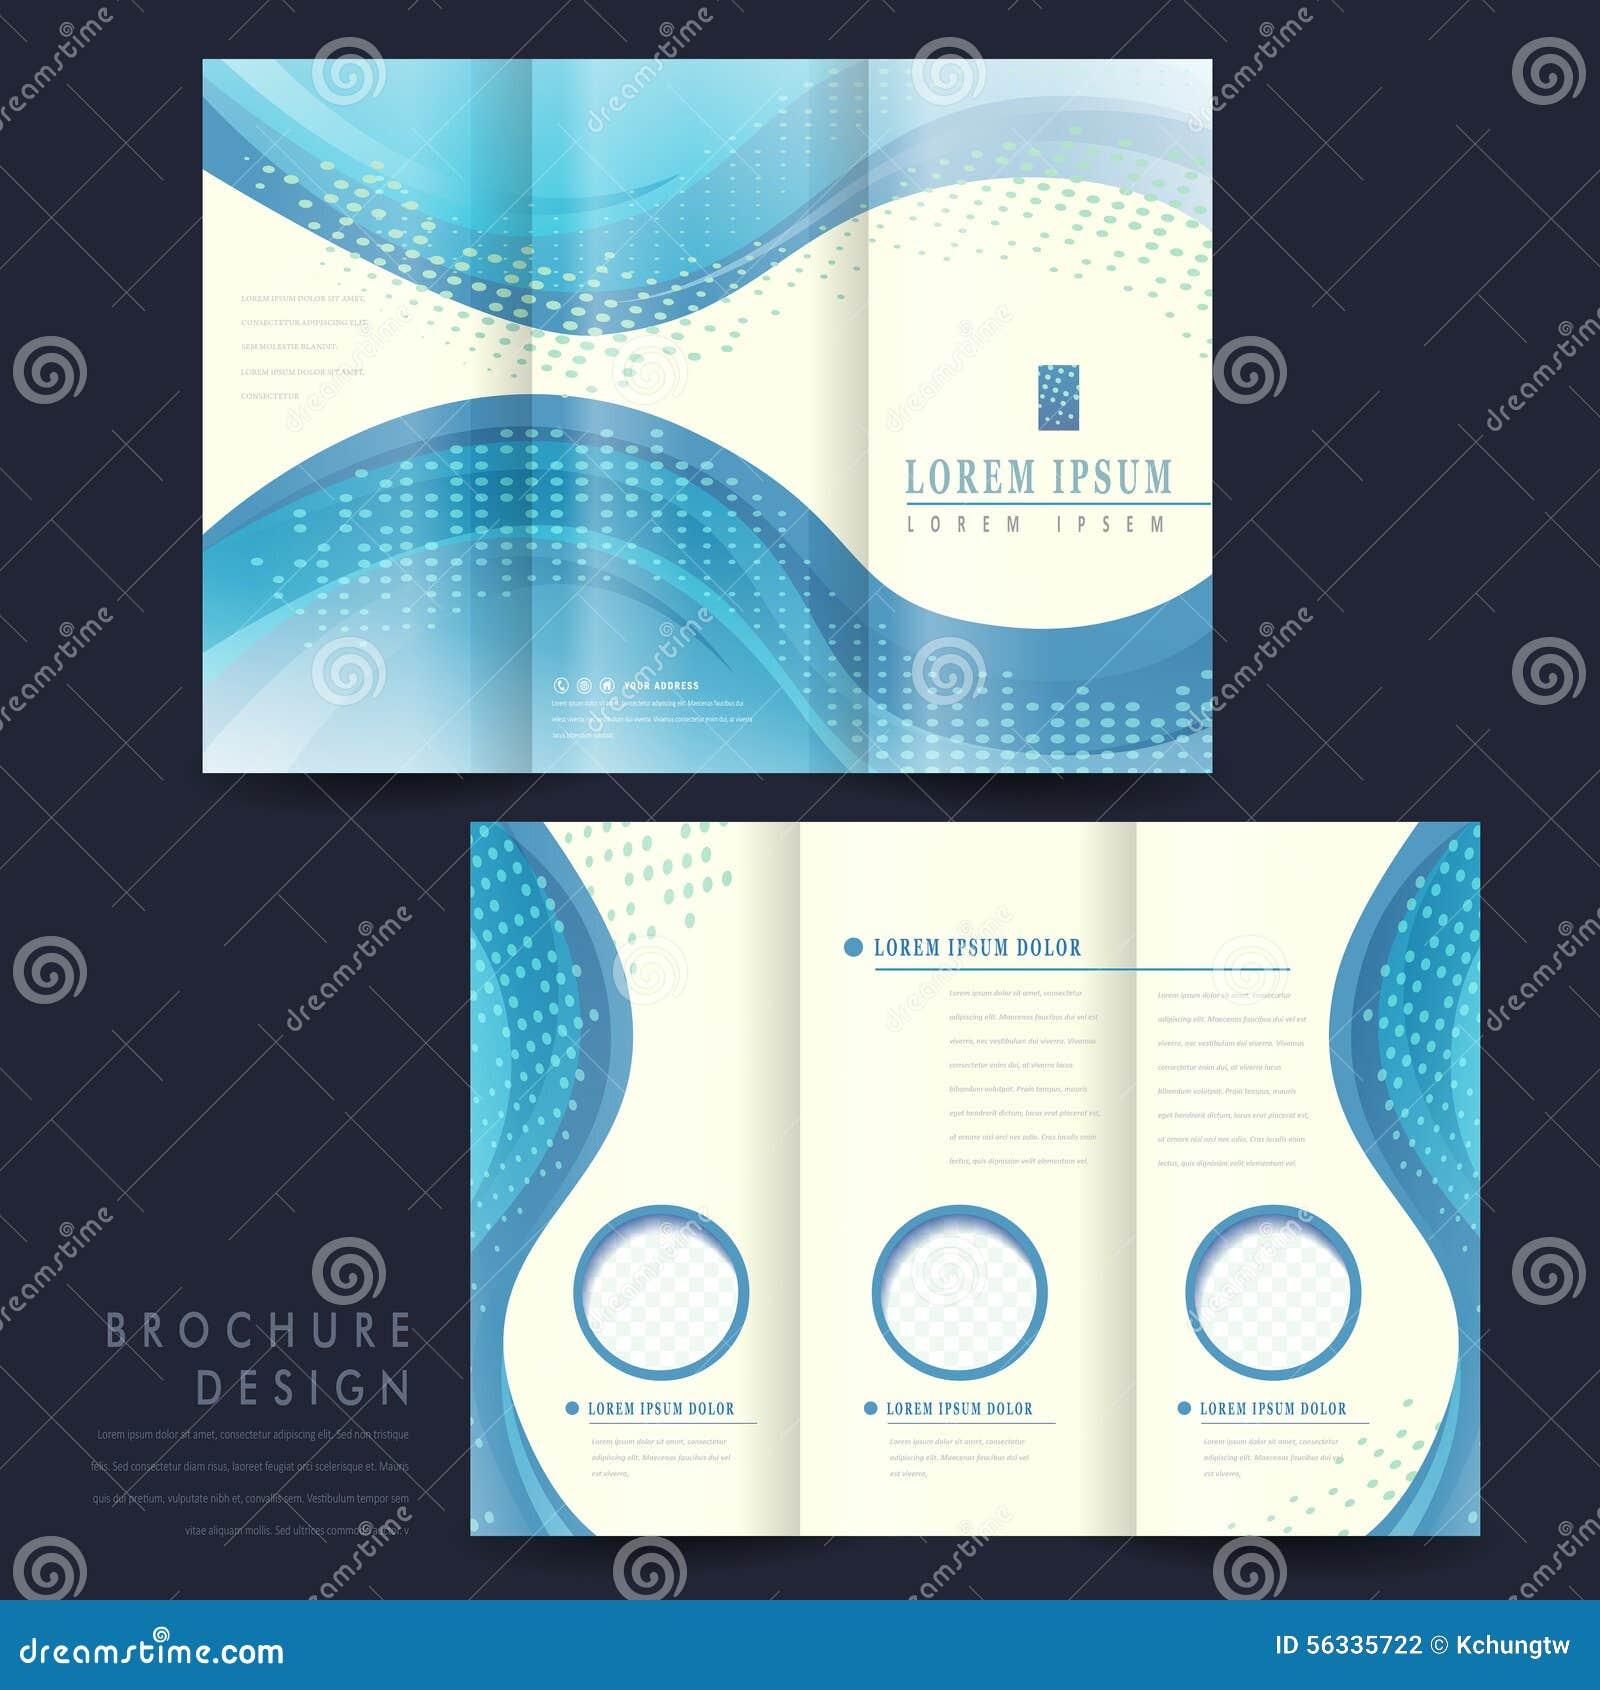 Elegant Tri Fold Brochure Template Design Illustration 56335722